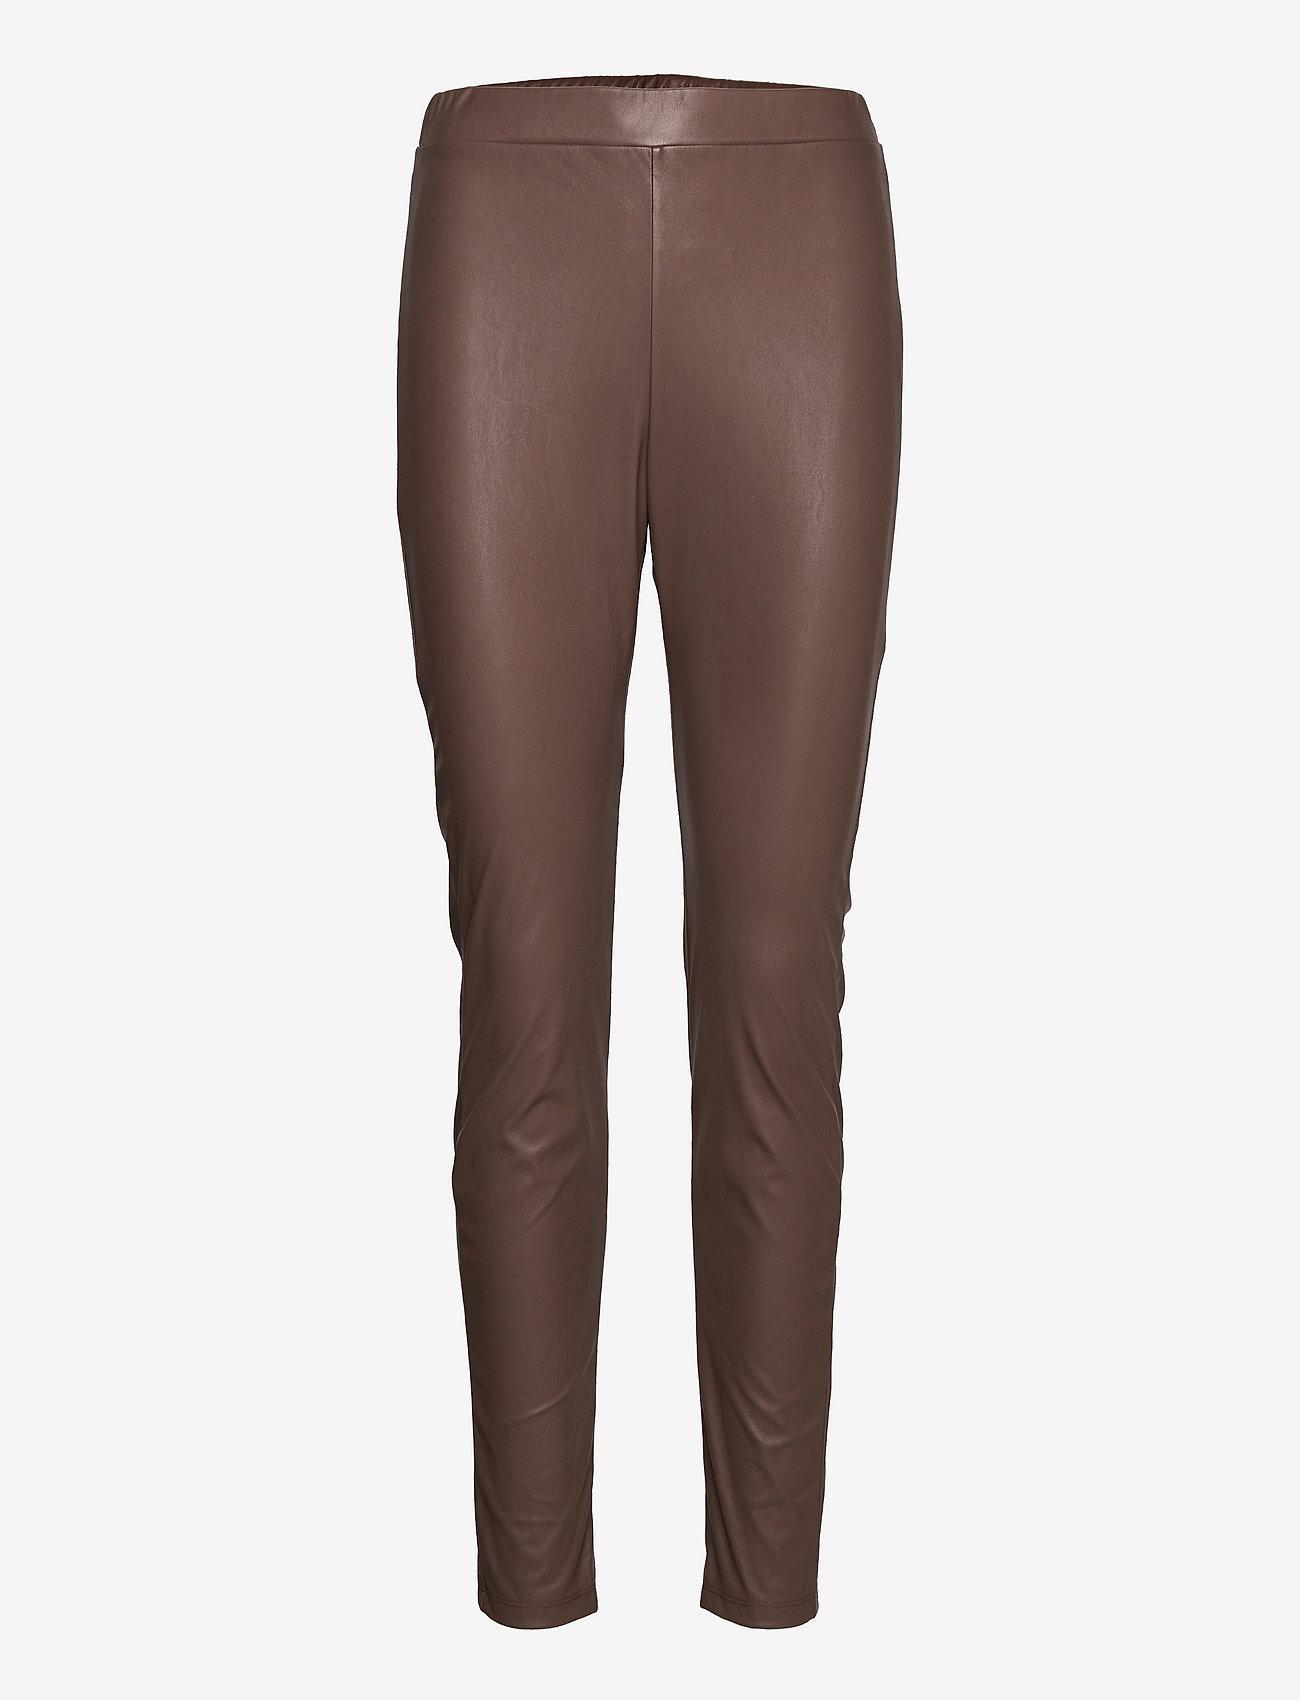 Max Mara Leisure - RANGHI - leather trousers - turtledove - 0